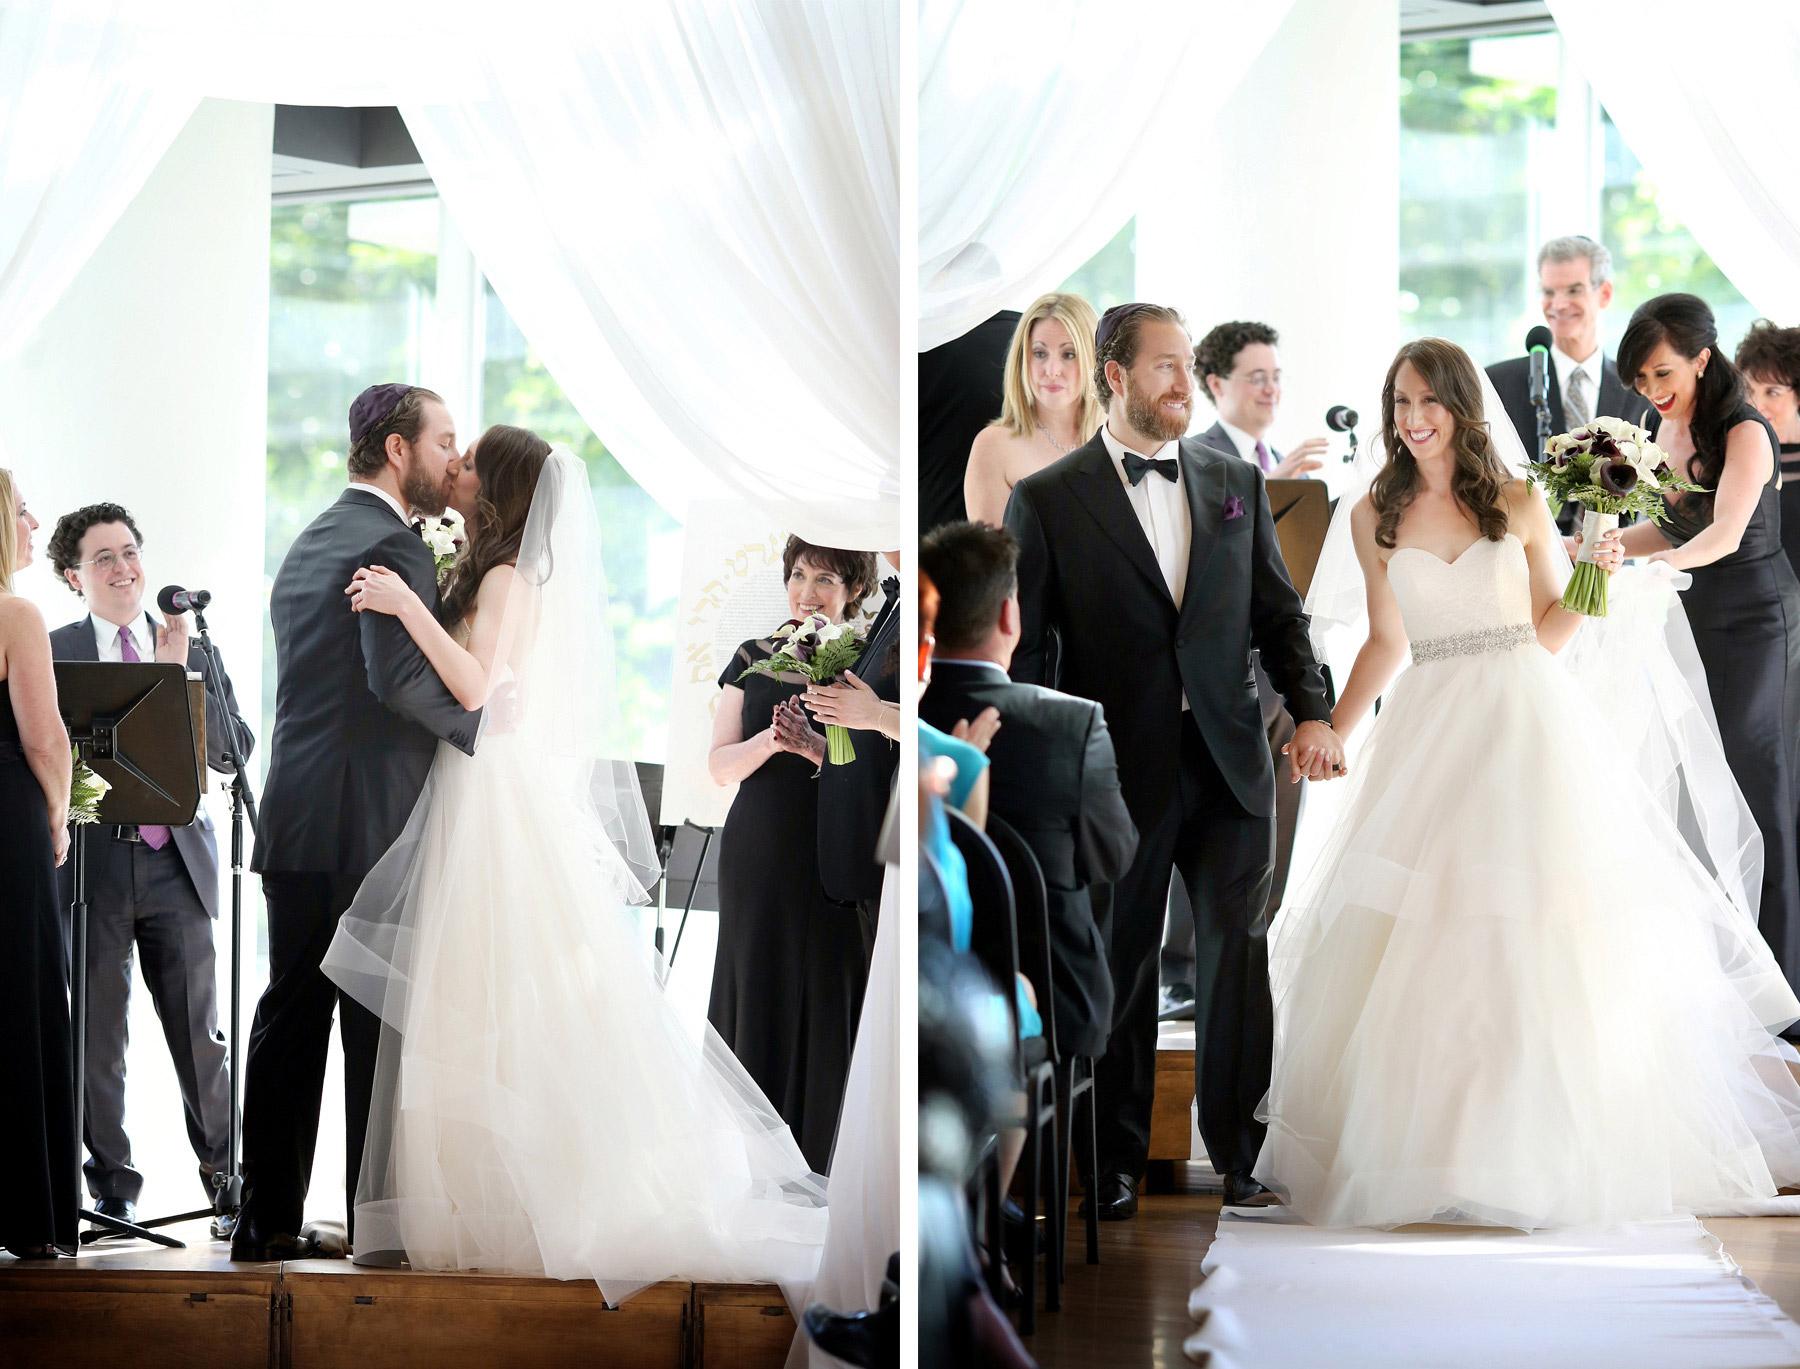 12-Minneapolis-Minnesota-Wedding-Photography-by-Vick-Photography-Hilton-Downtown-Ceremony-Lisa-and-Jared.jpg